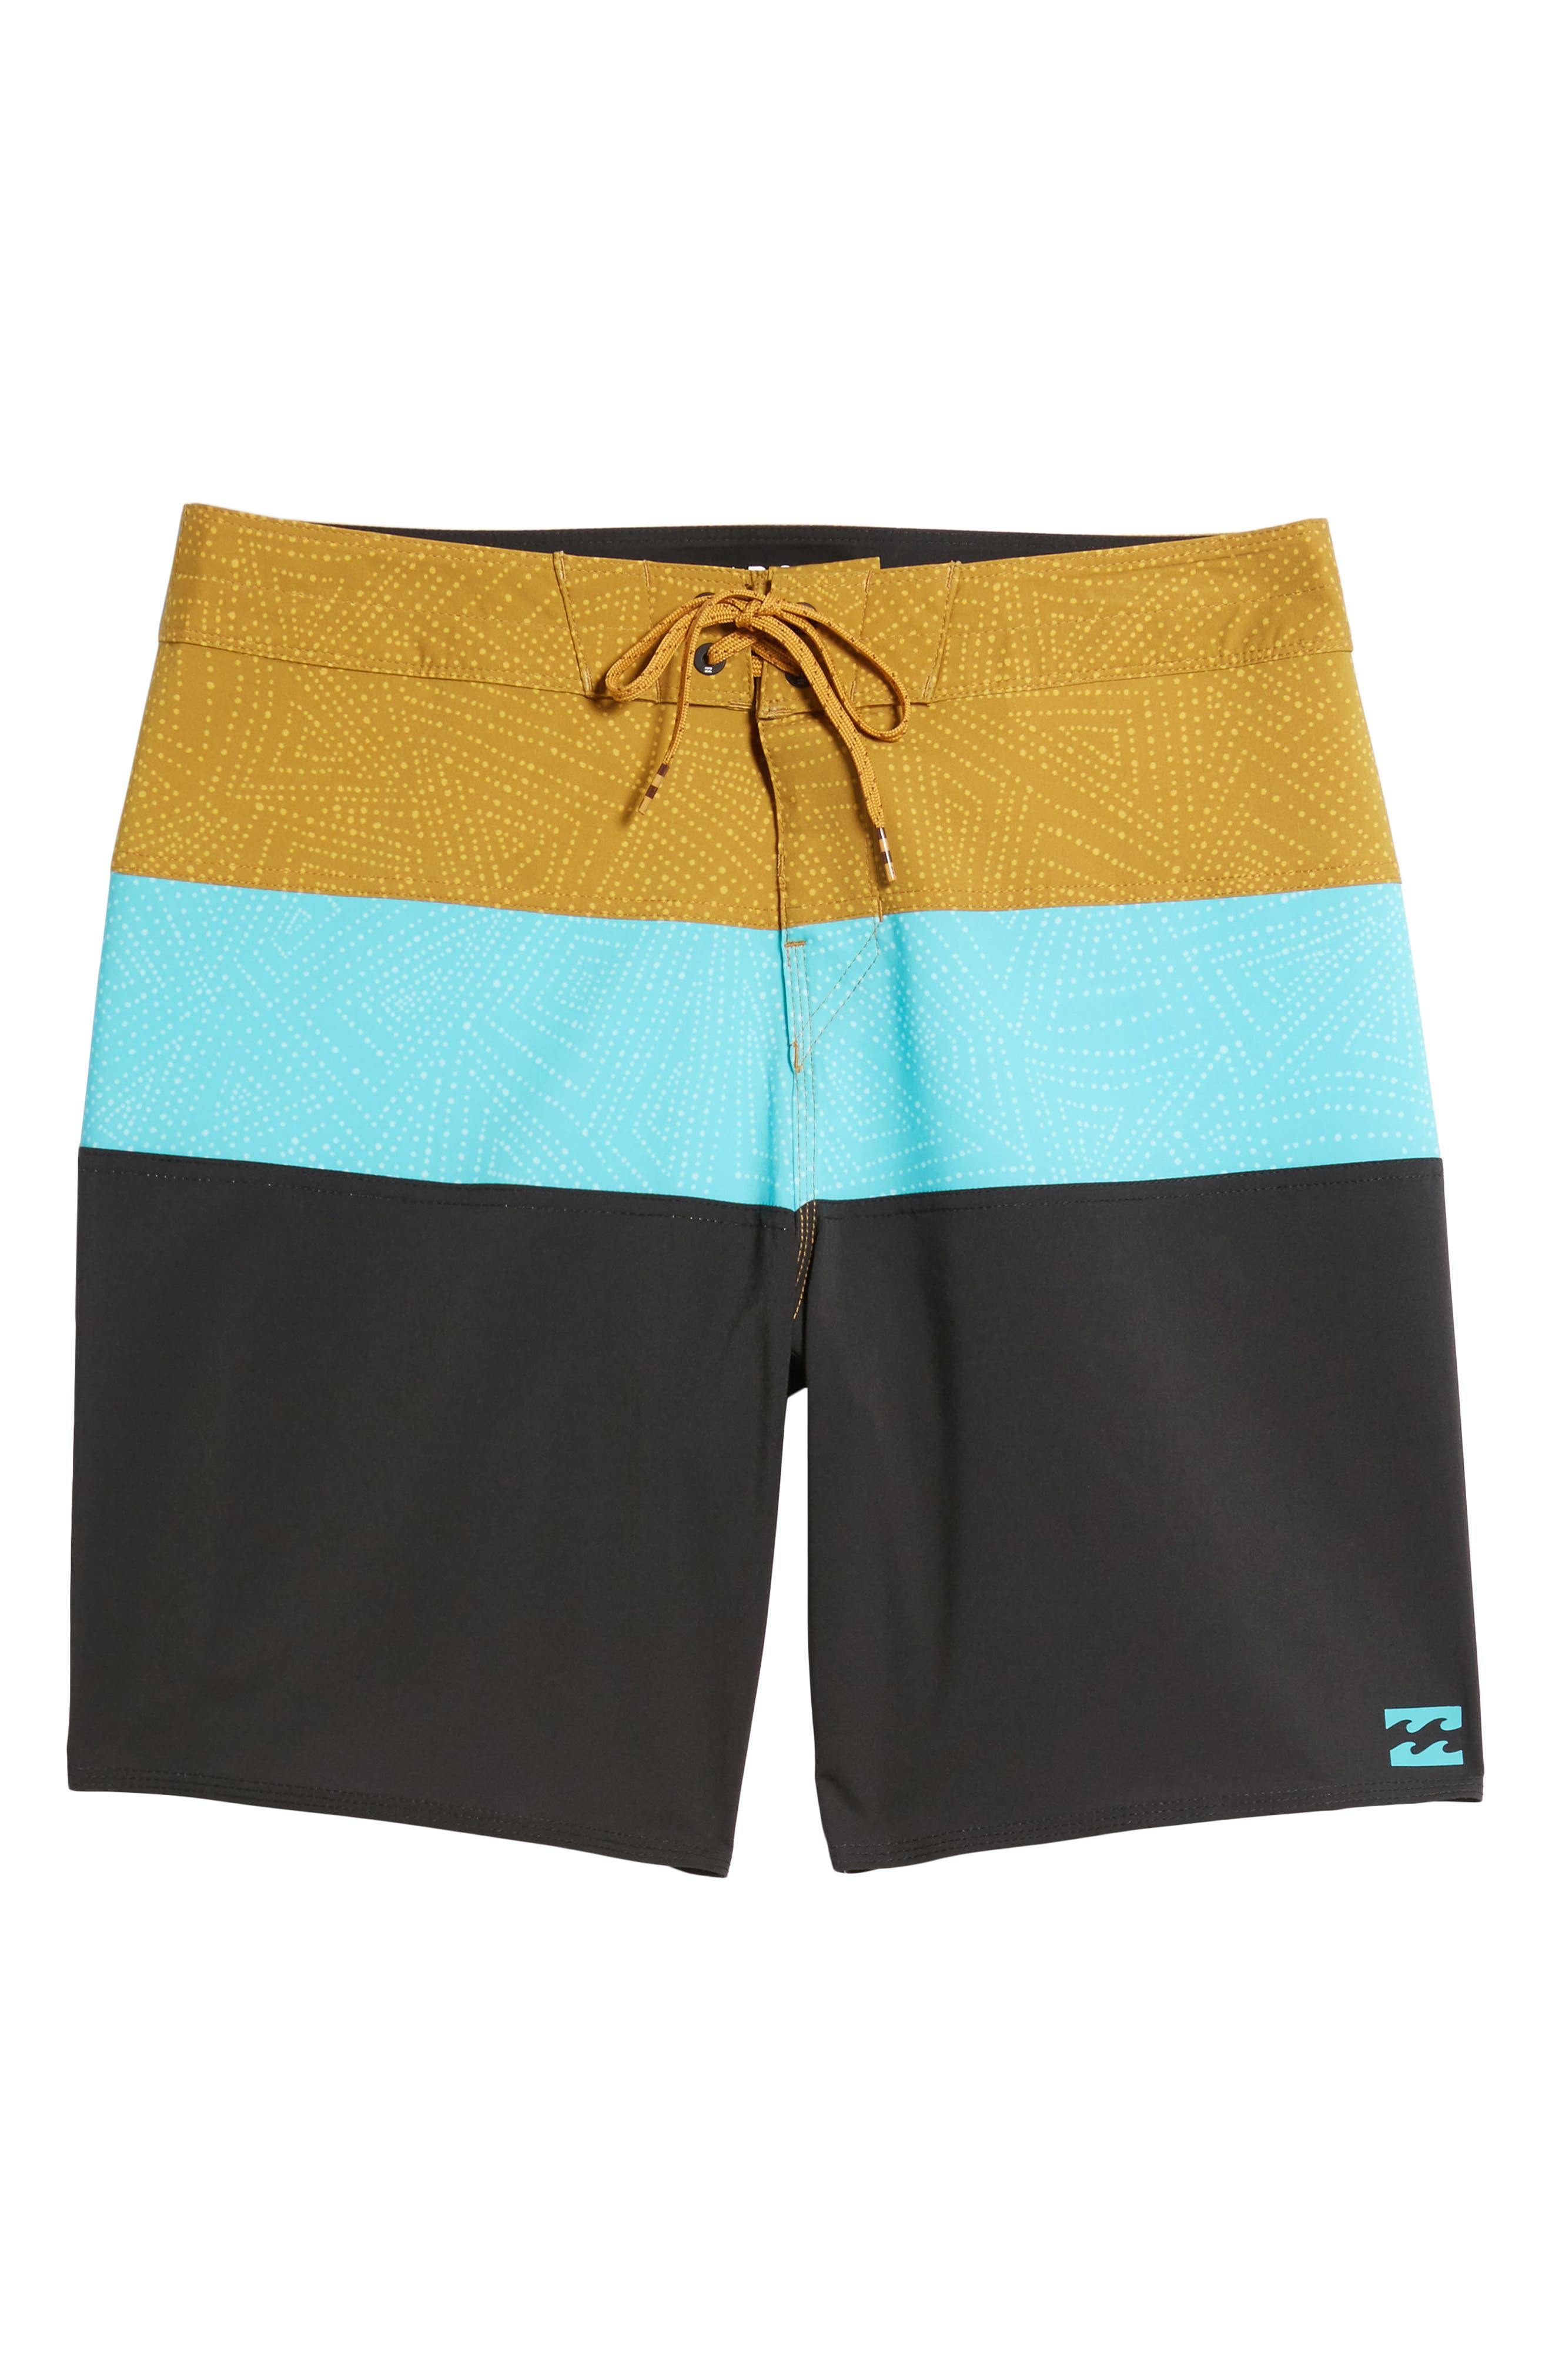 Tribong X Board Shorts,                             Alternate thumbnail 6, color,                             Aqua